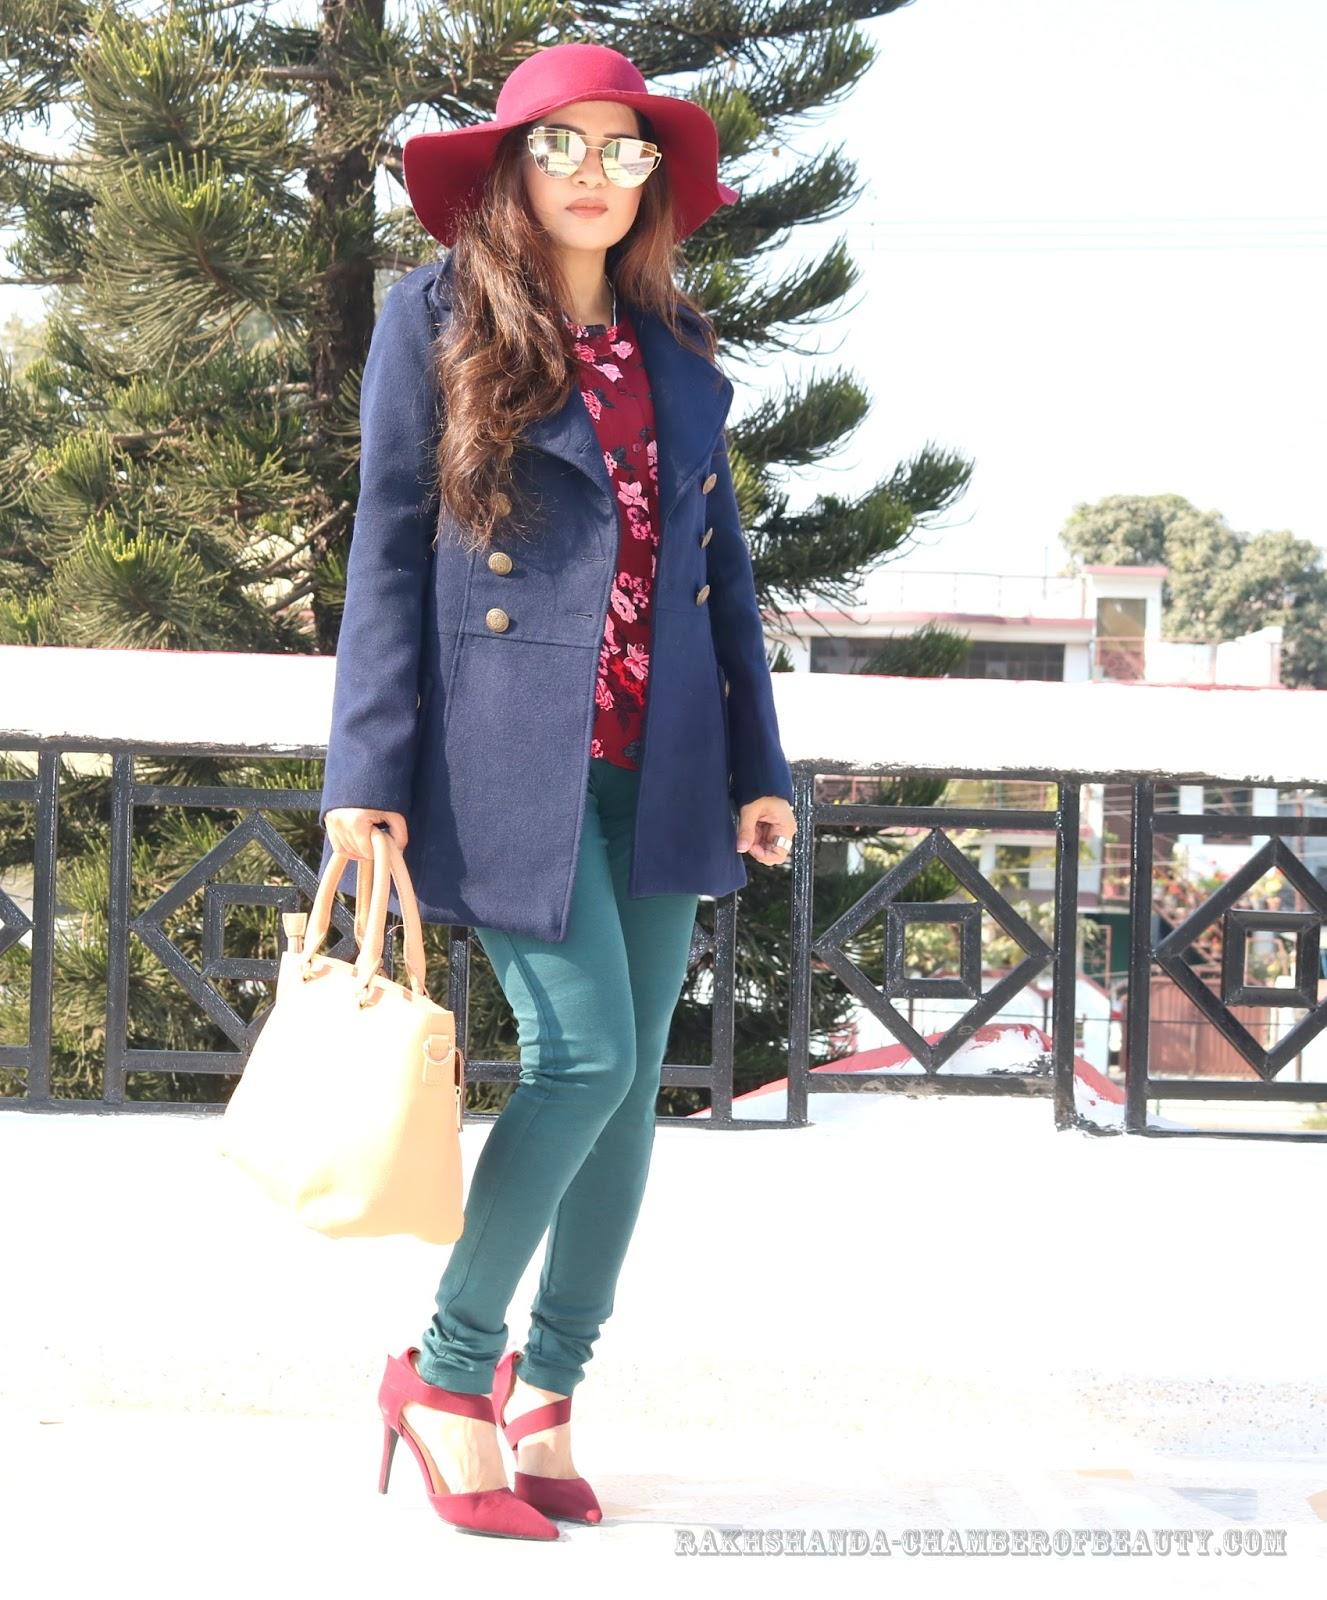 Fashion blogger/rakhshanda-chamberofbeauty/Max fashion/how to style printed shirt in winter